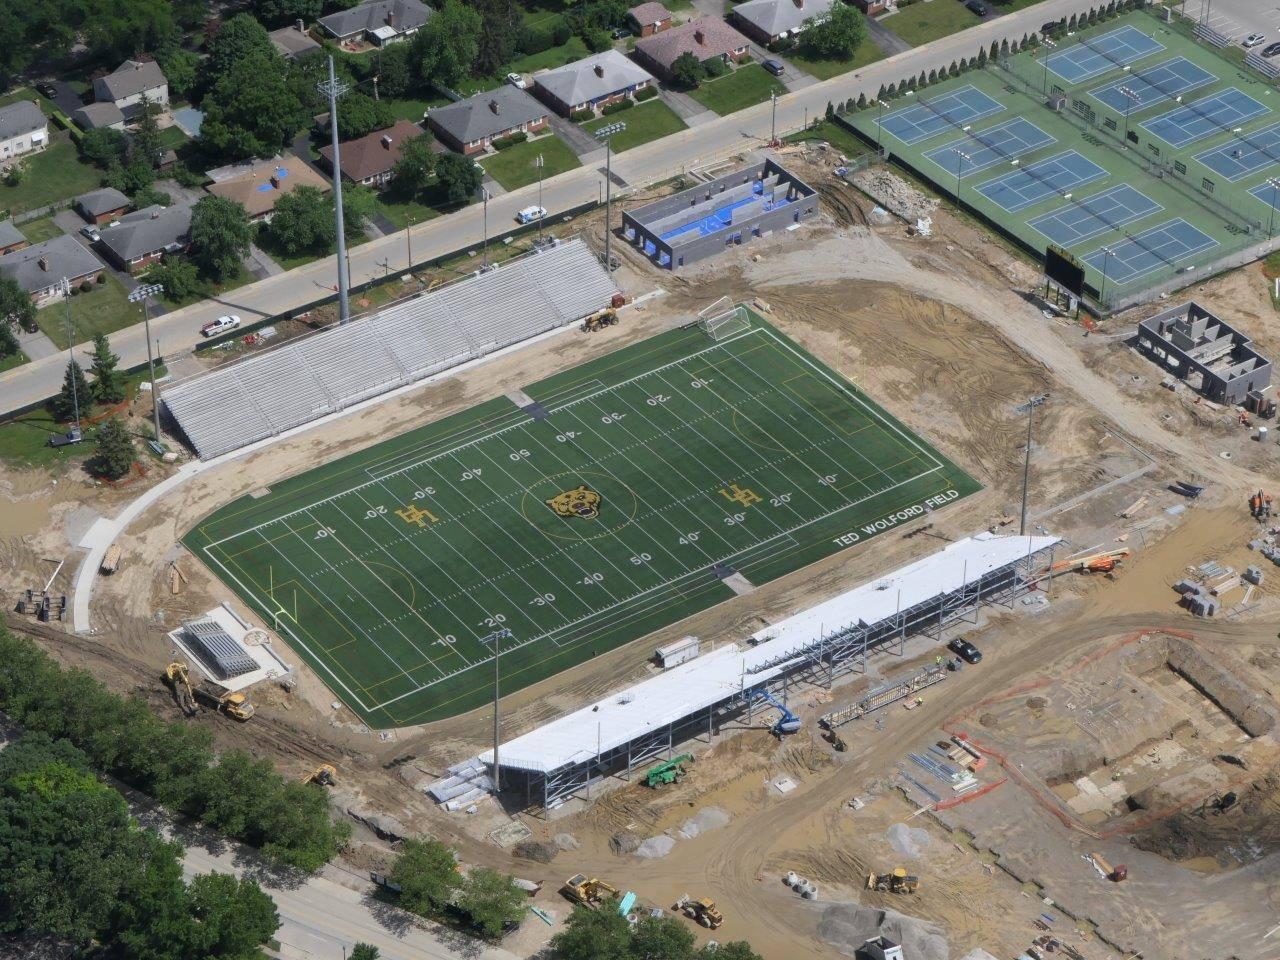 Stadium aerial looking southeast